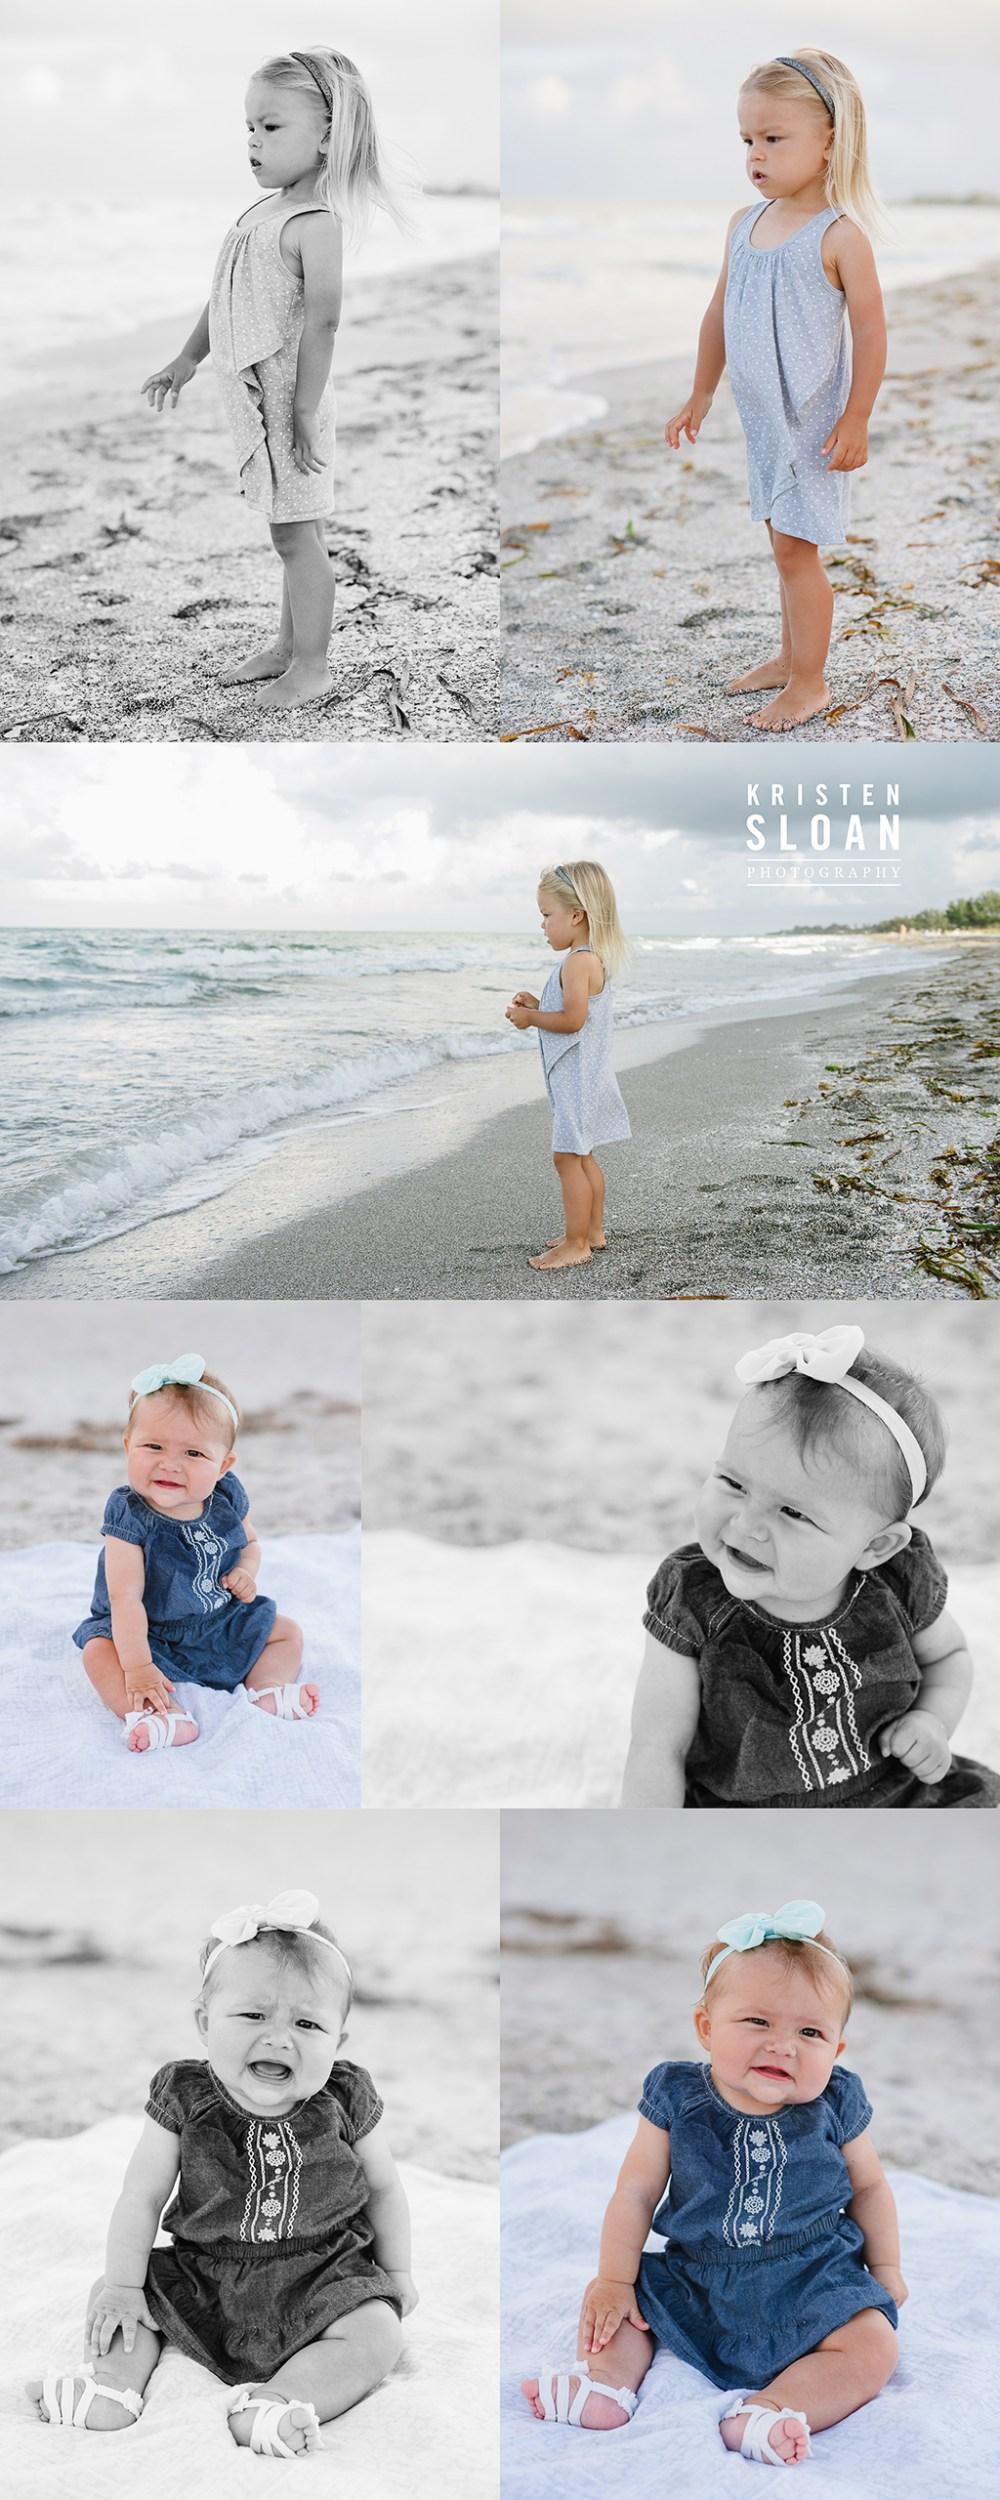 Longboat Key Little Gull Cottages Family Kids Beach Portraits by Kristen Sloan Photography